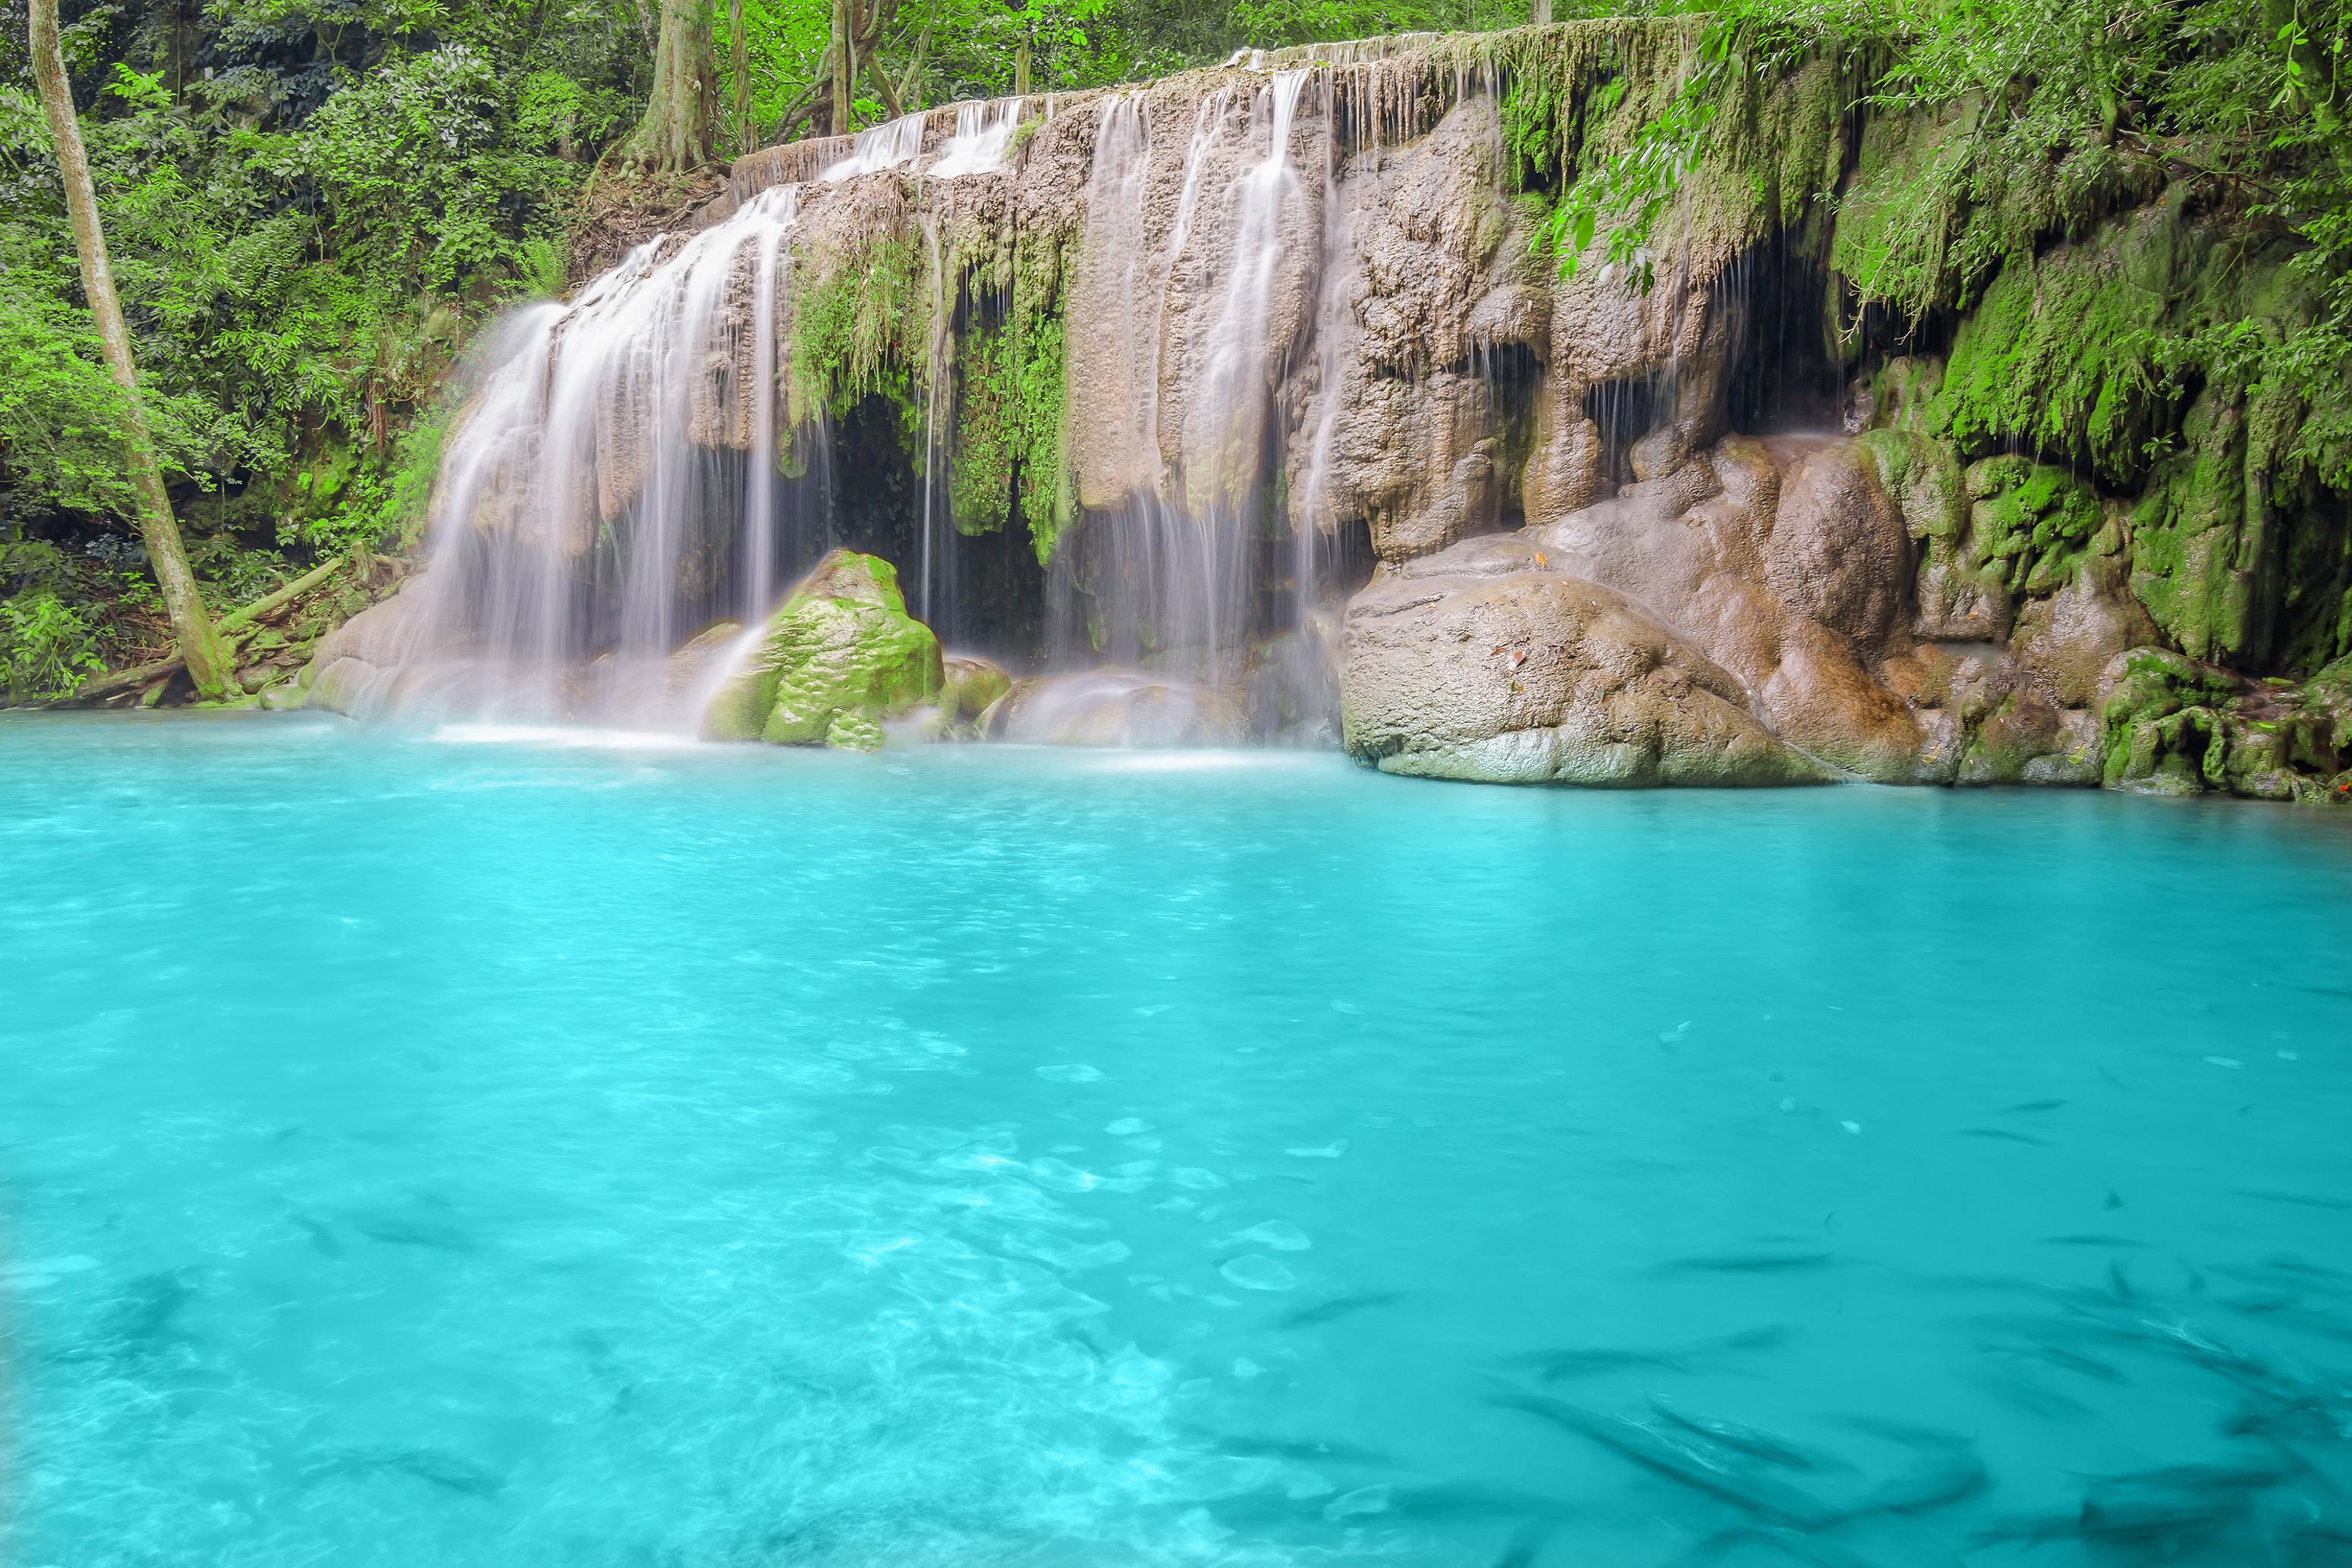 Paesaggi D Acqua Piscine sfondi : paesaggio, cascata, natura, piscina, laguna